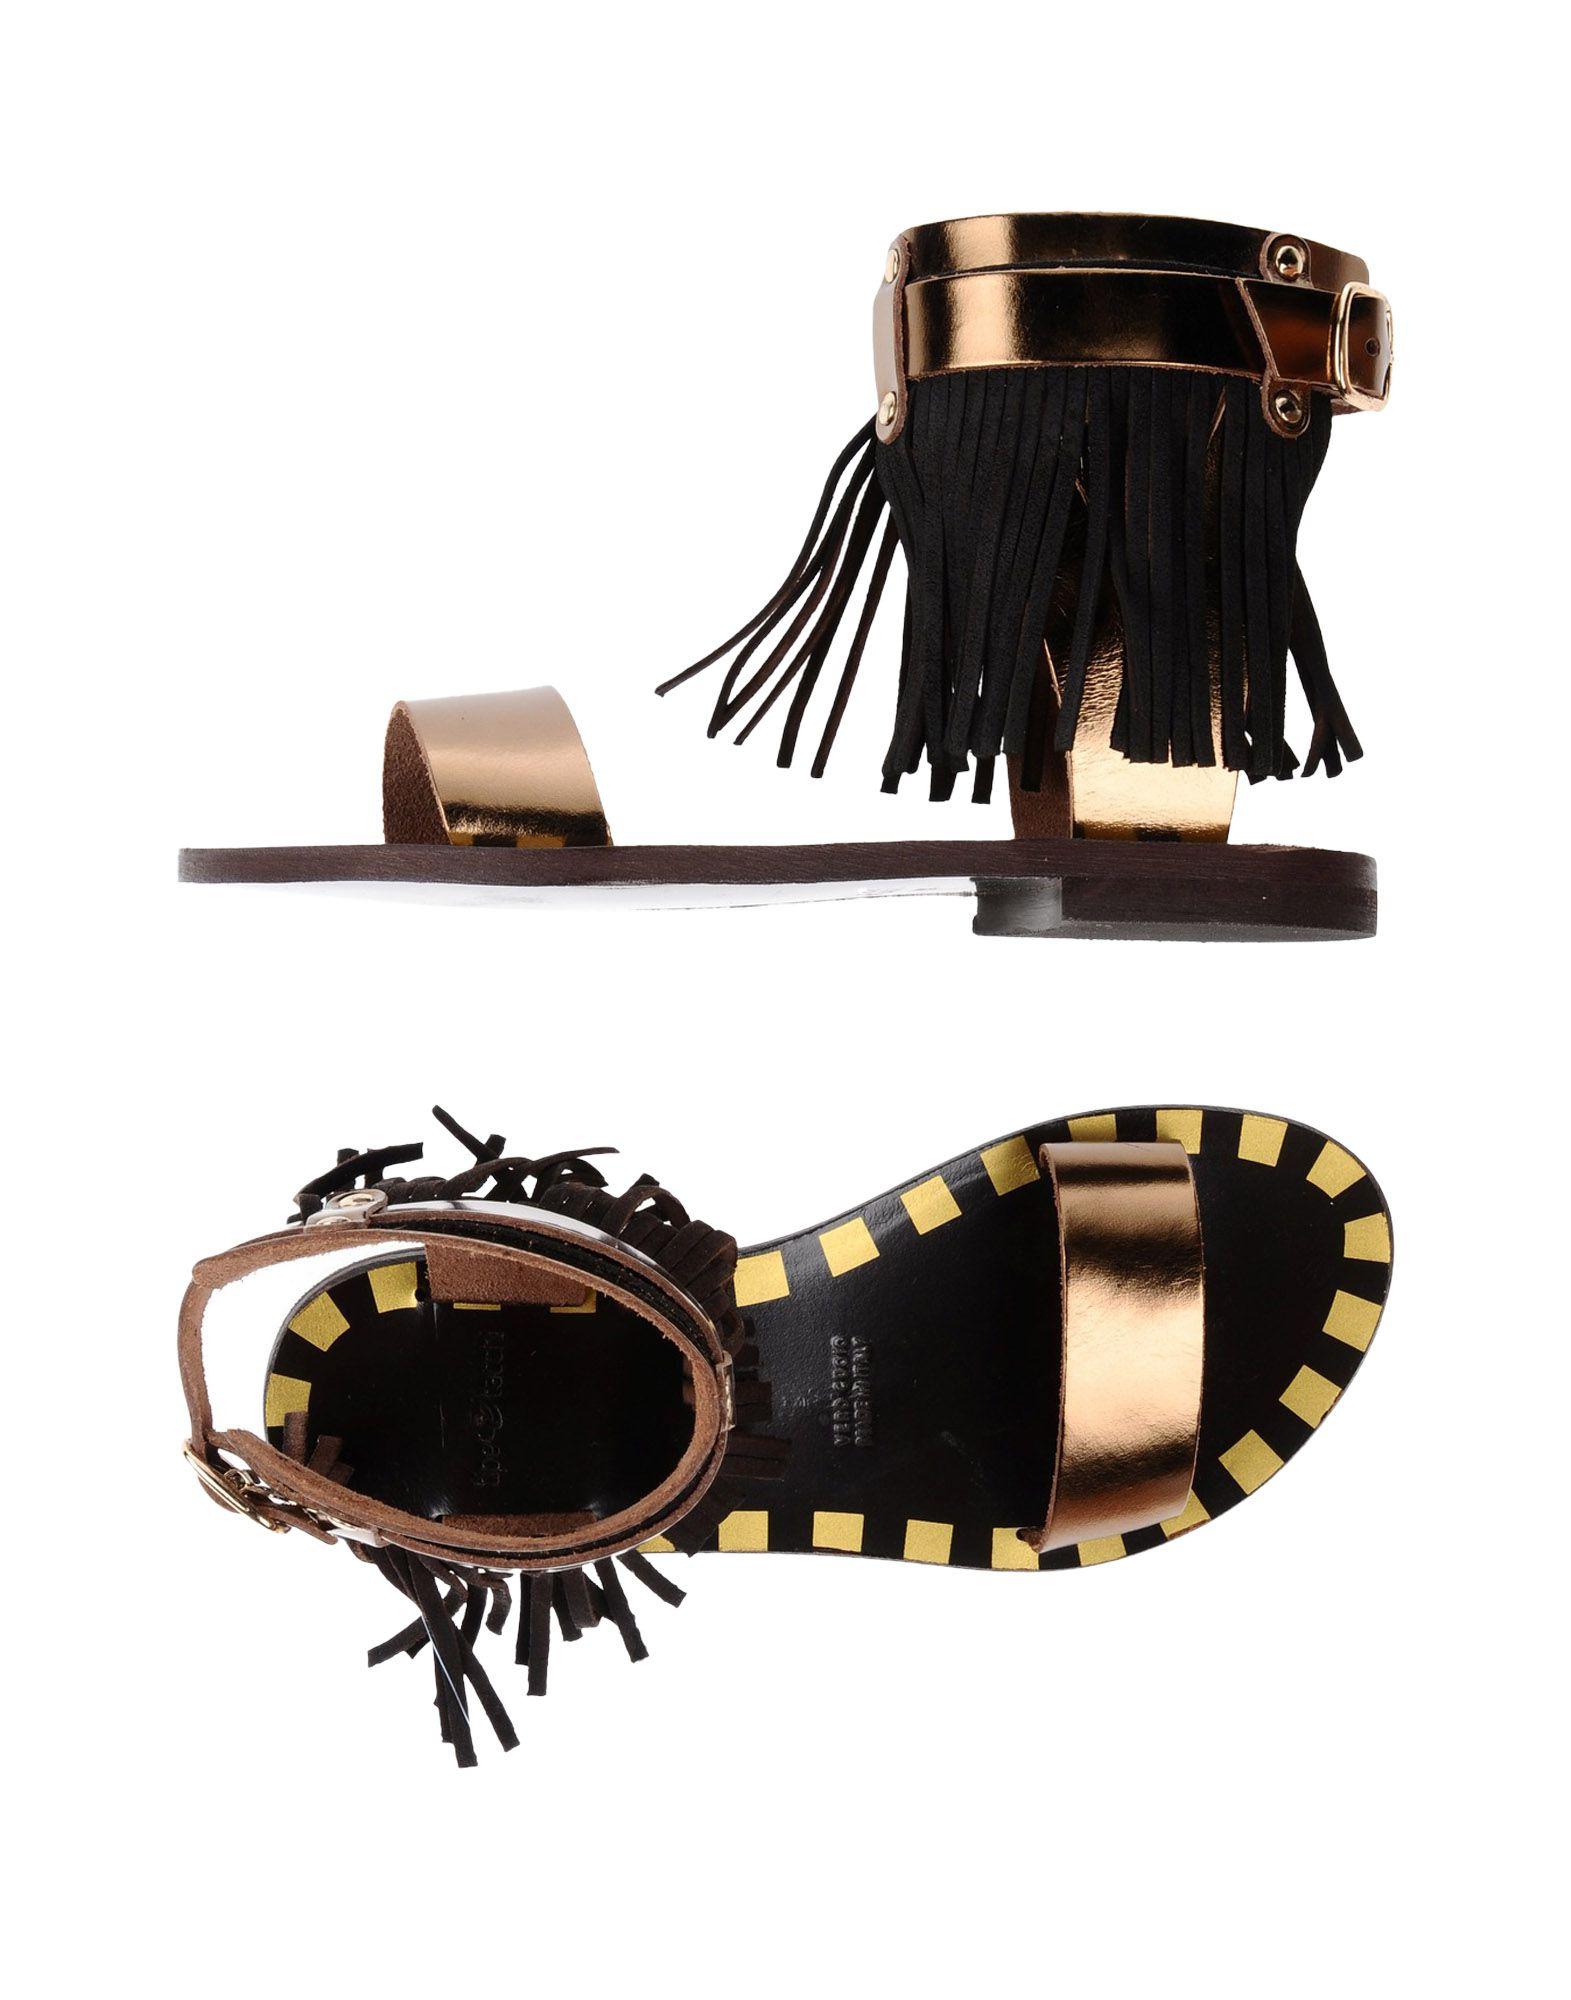 TIPE E TACCHI Damen Sandale Farbe Bronze Größe 9 jetztbilligerkaufen